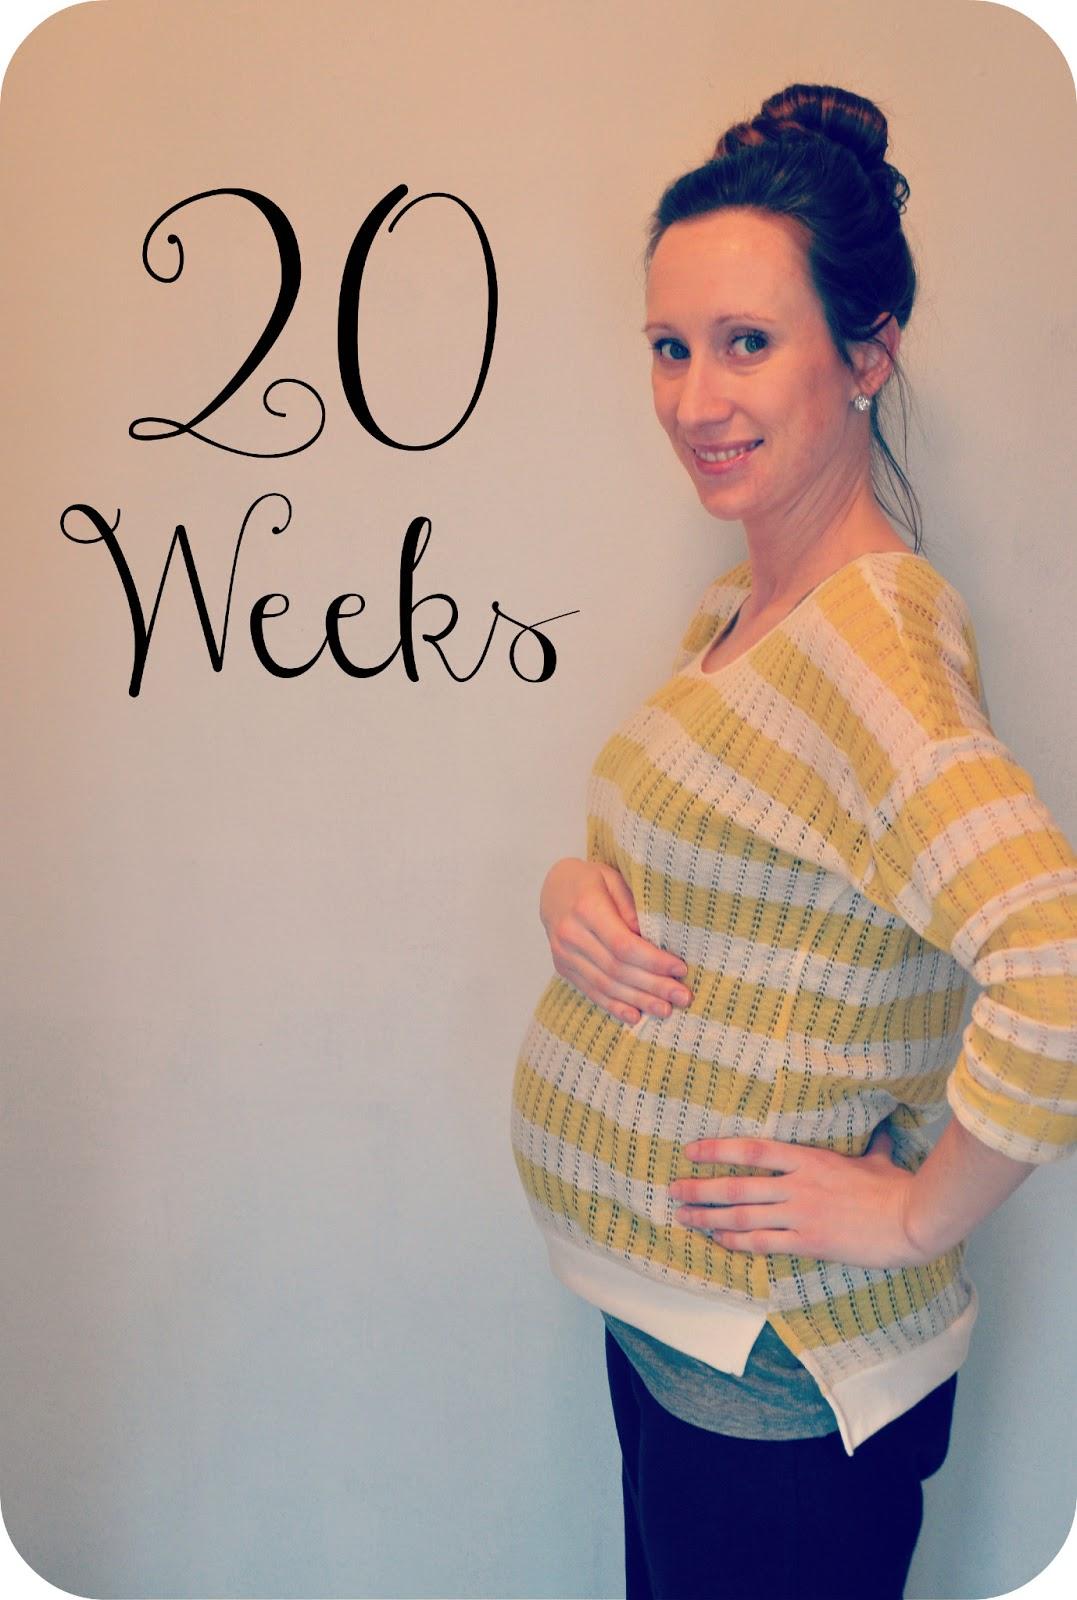 20 week pregnant thai teen heather deep deepthroats whip cream 8